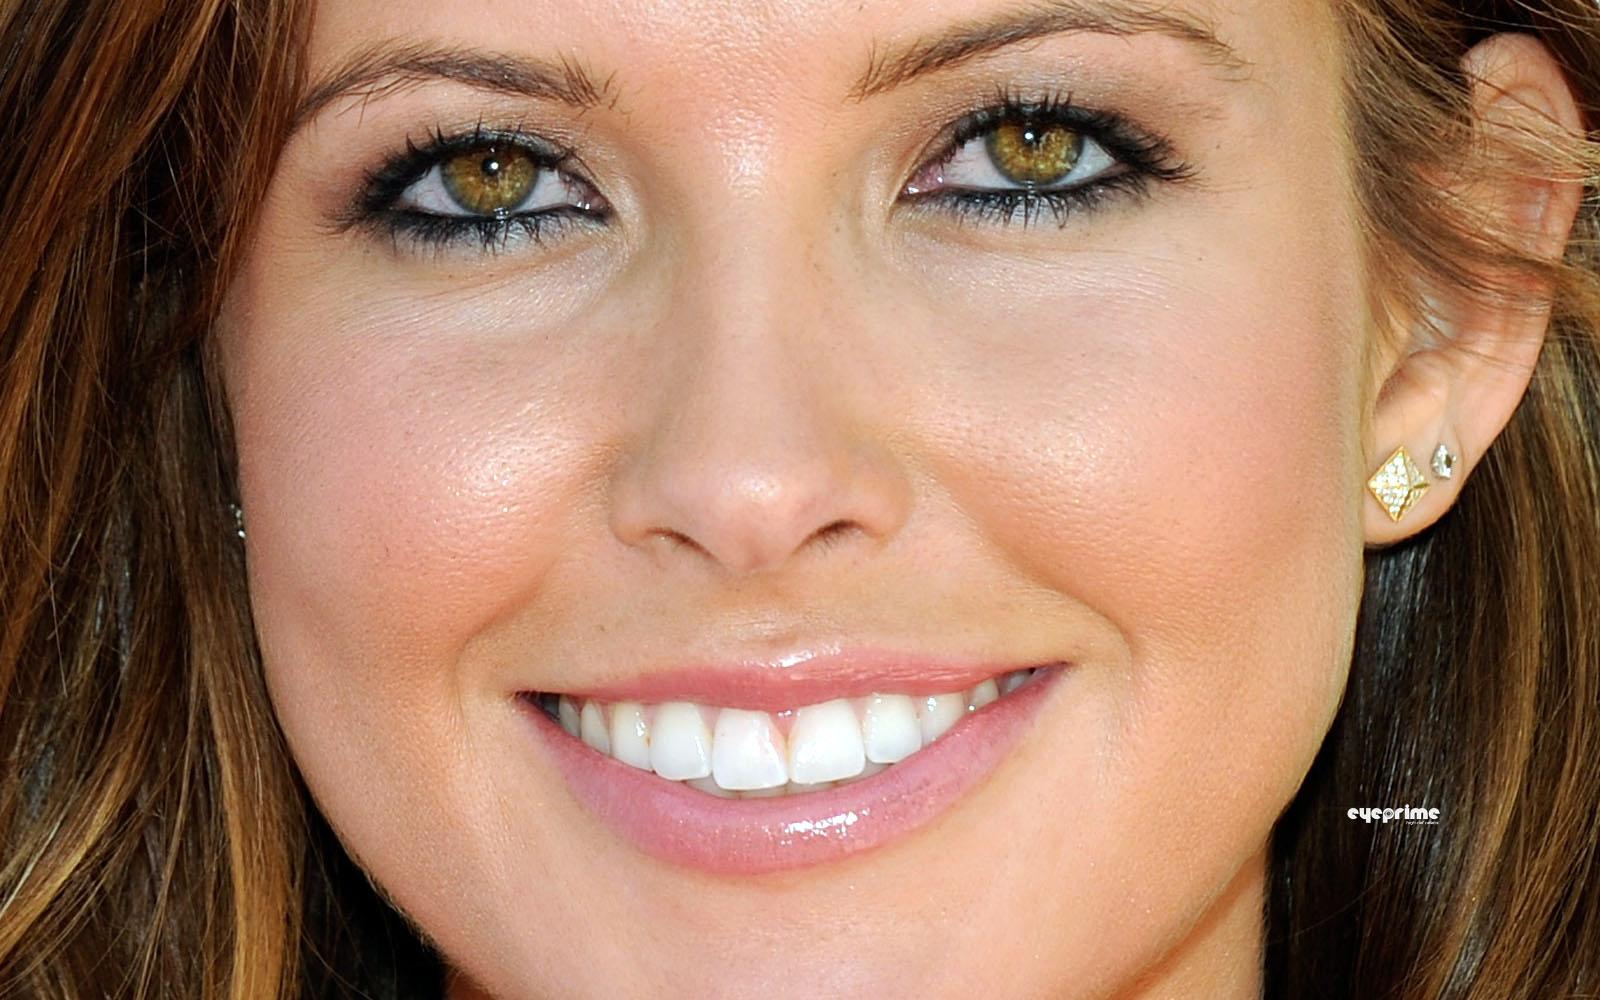 http://1.bp.blogspot.com/_cnya8urXwzU/S-XbNHDp8nI/AAAAAAAAGj8/NHsykfNxP-0/s1600/patridge_eyeprime_89.jpg